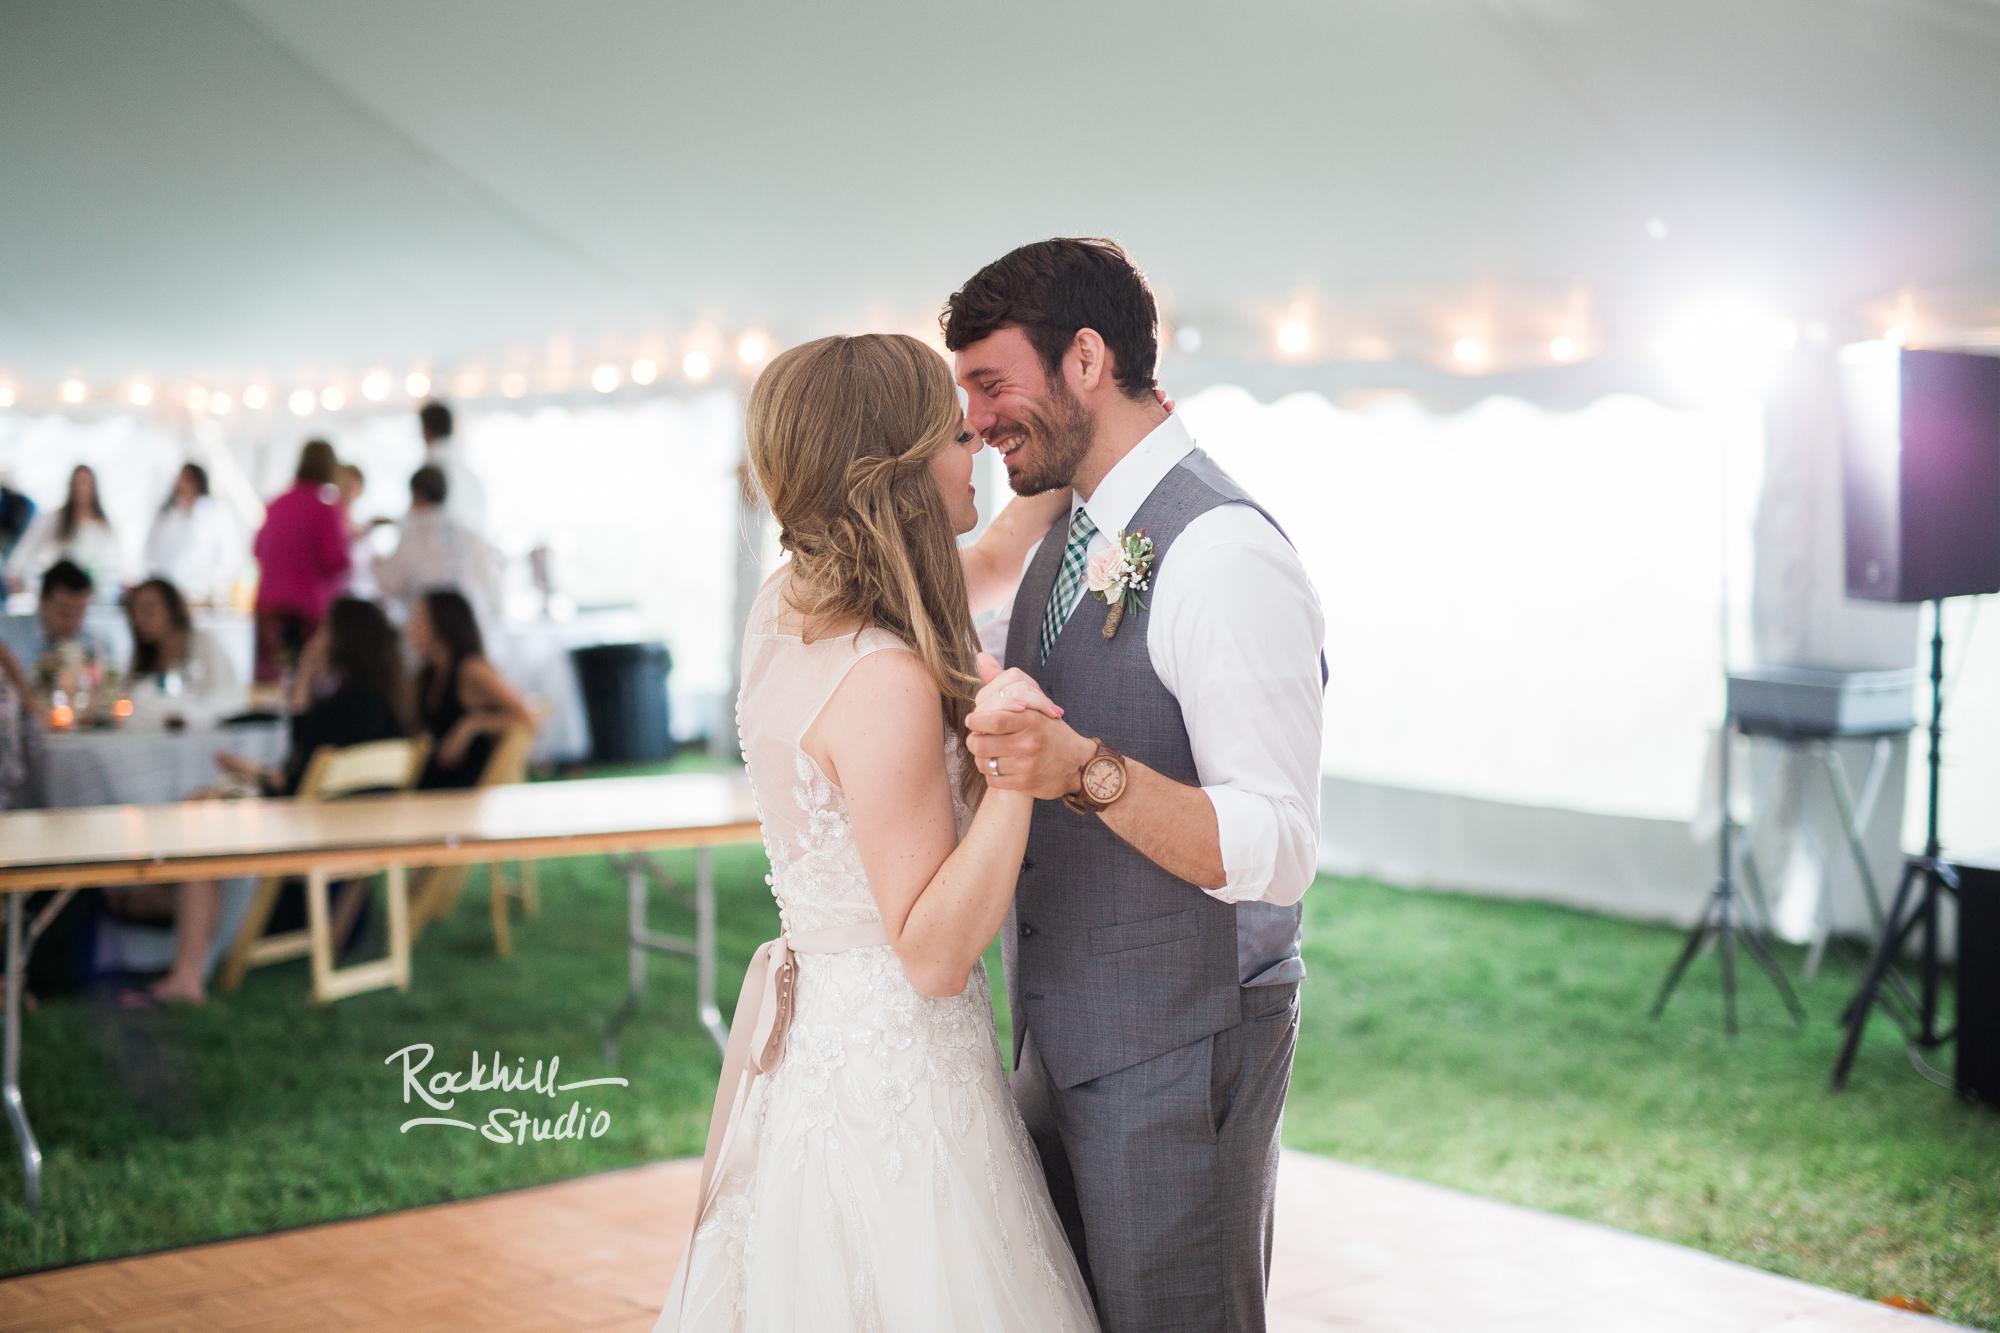 marquette-michigan-wedding-upper-peninsula-spring-photography-rockhill-ee-67.jpg